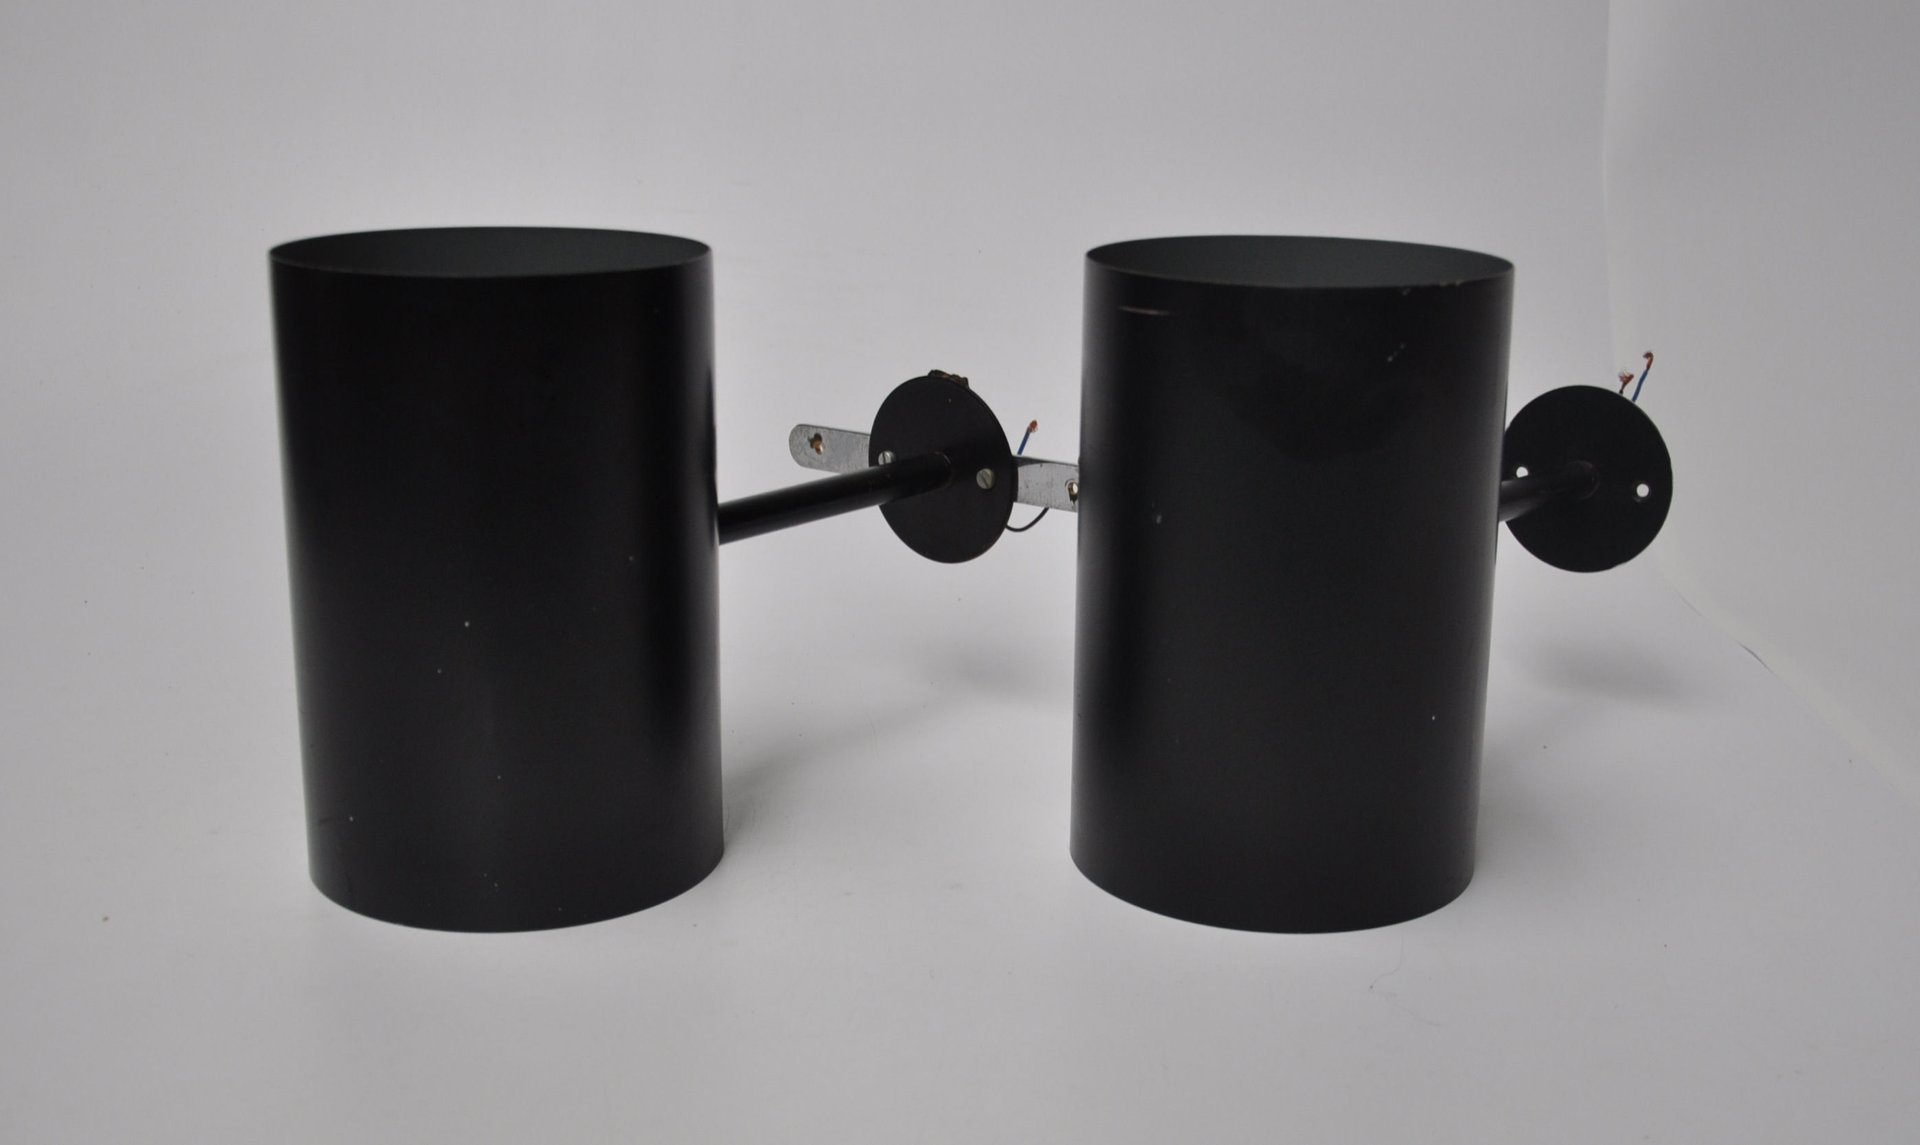 schwarze vintage metall wandleuchten von friis moltke. Black Bedroom Furniture Sets. Home Design Ideas